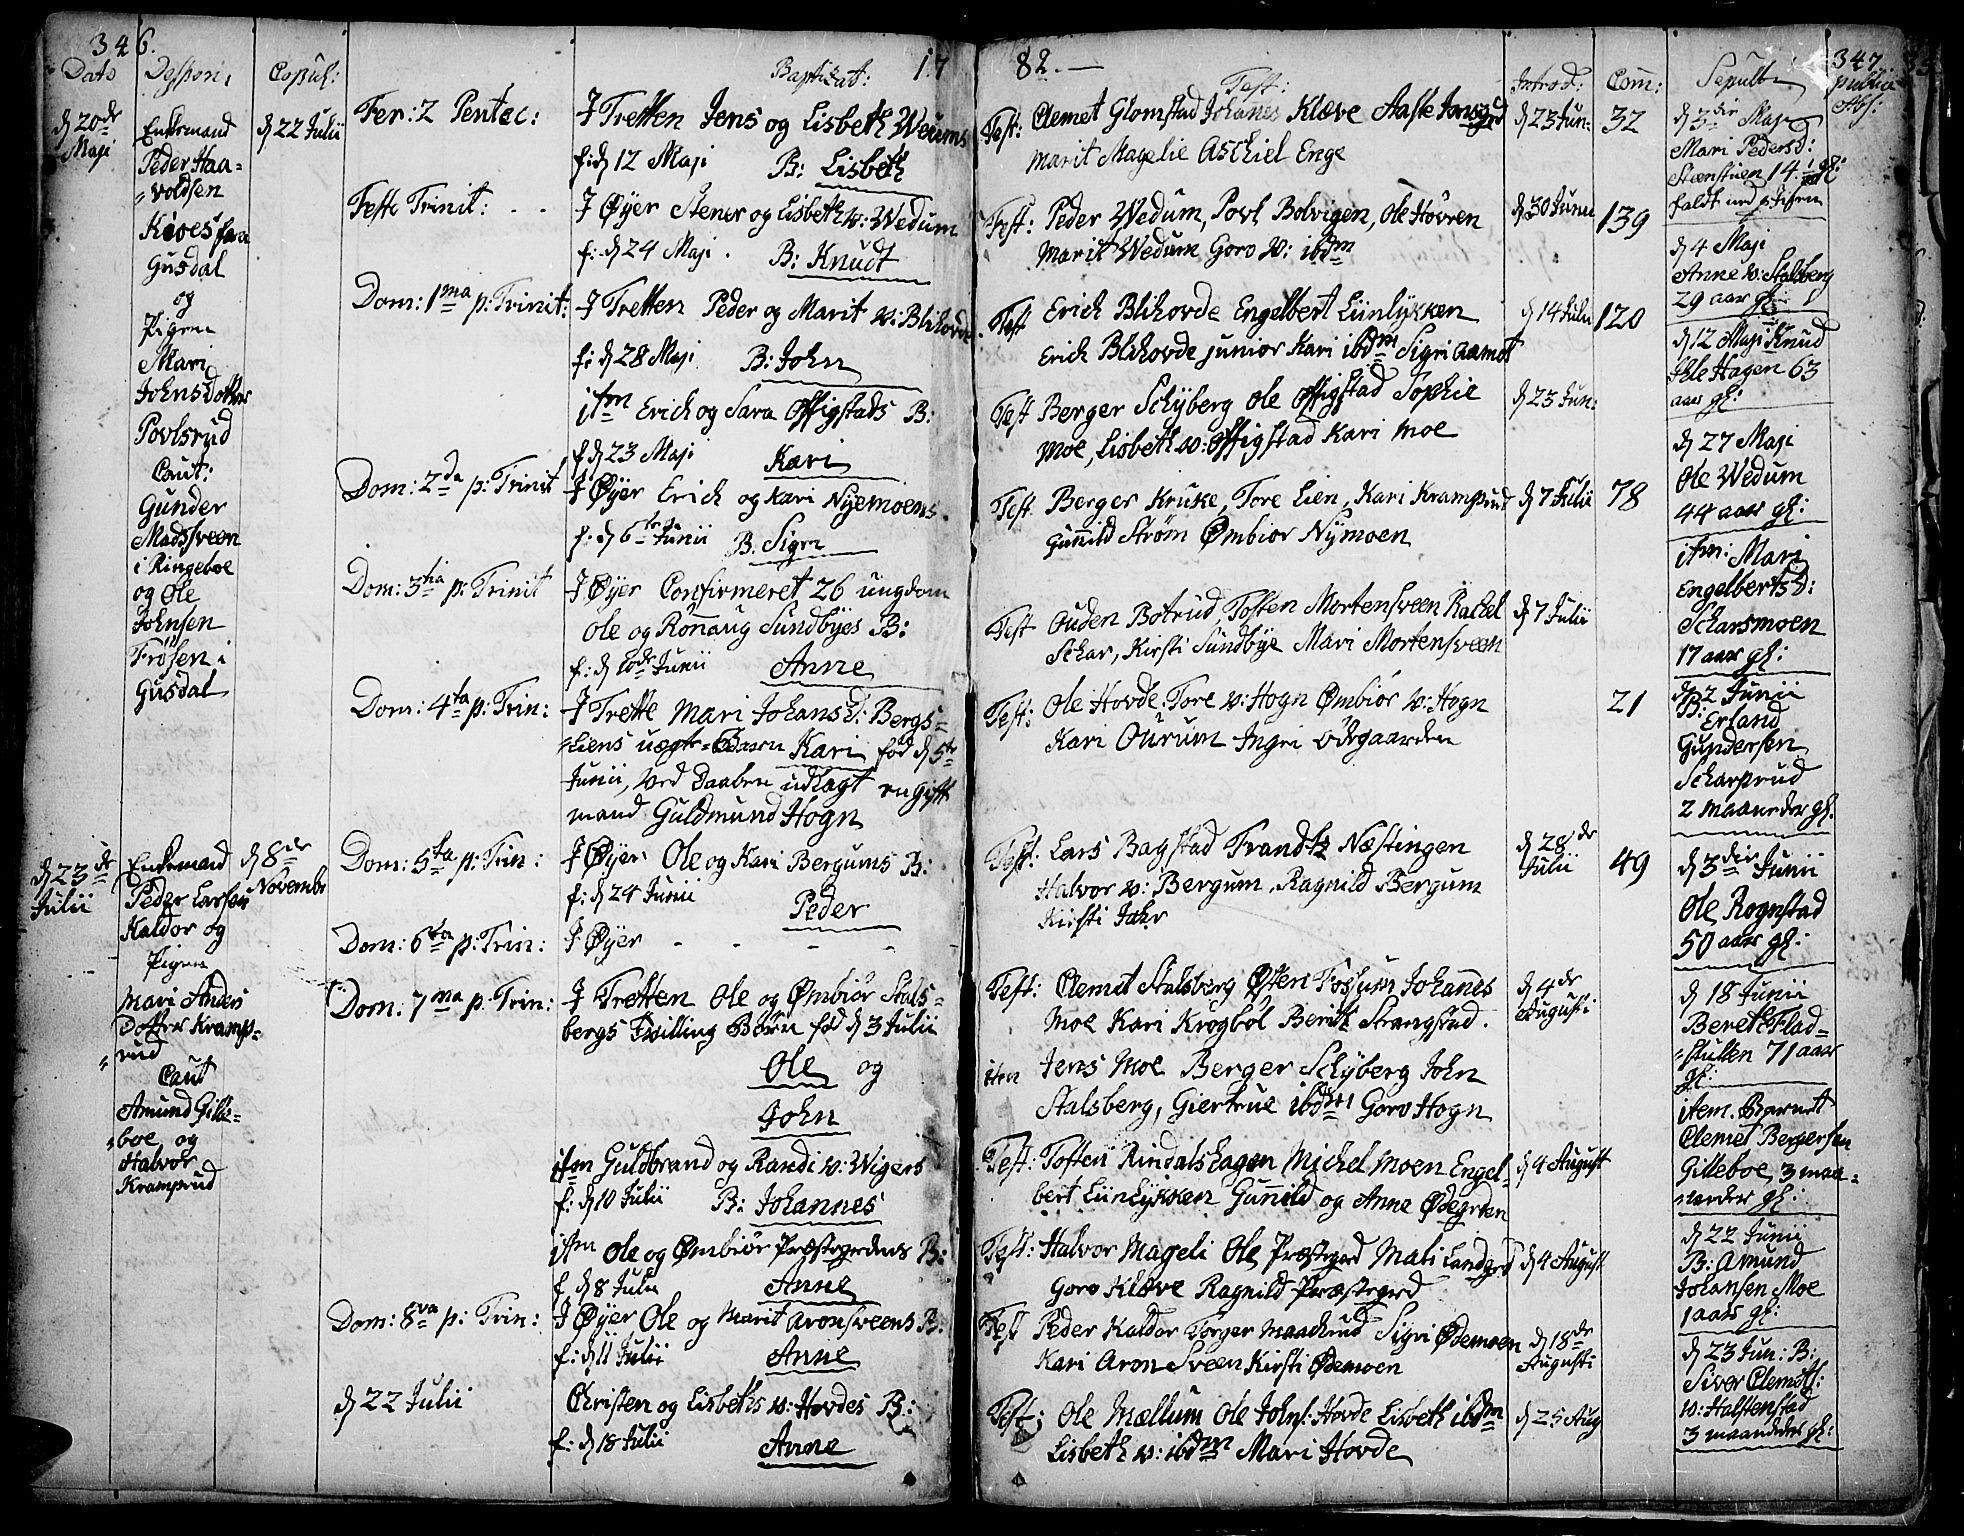 SAH, Øyer prestekontor, Ministerialbok nr. 2, 1733-1784, s. 346-347